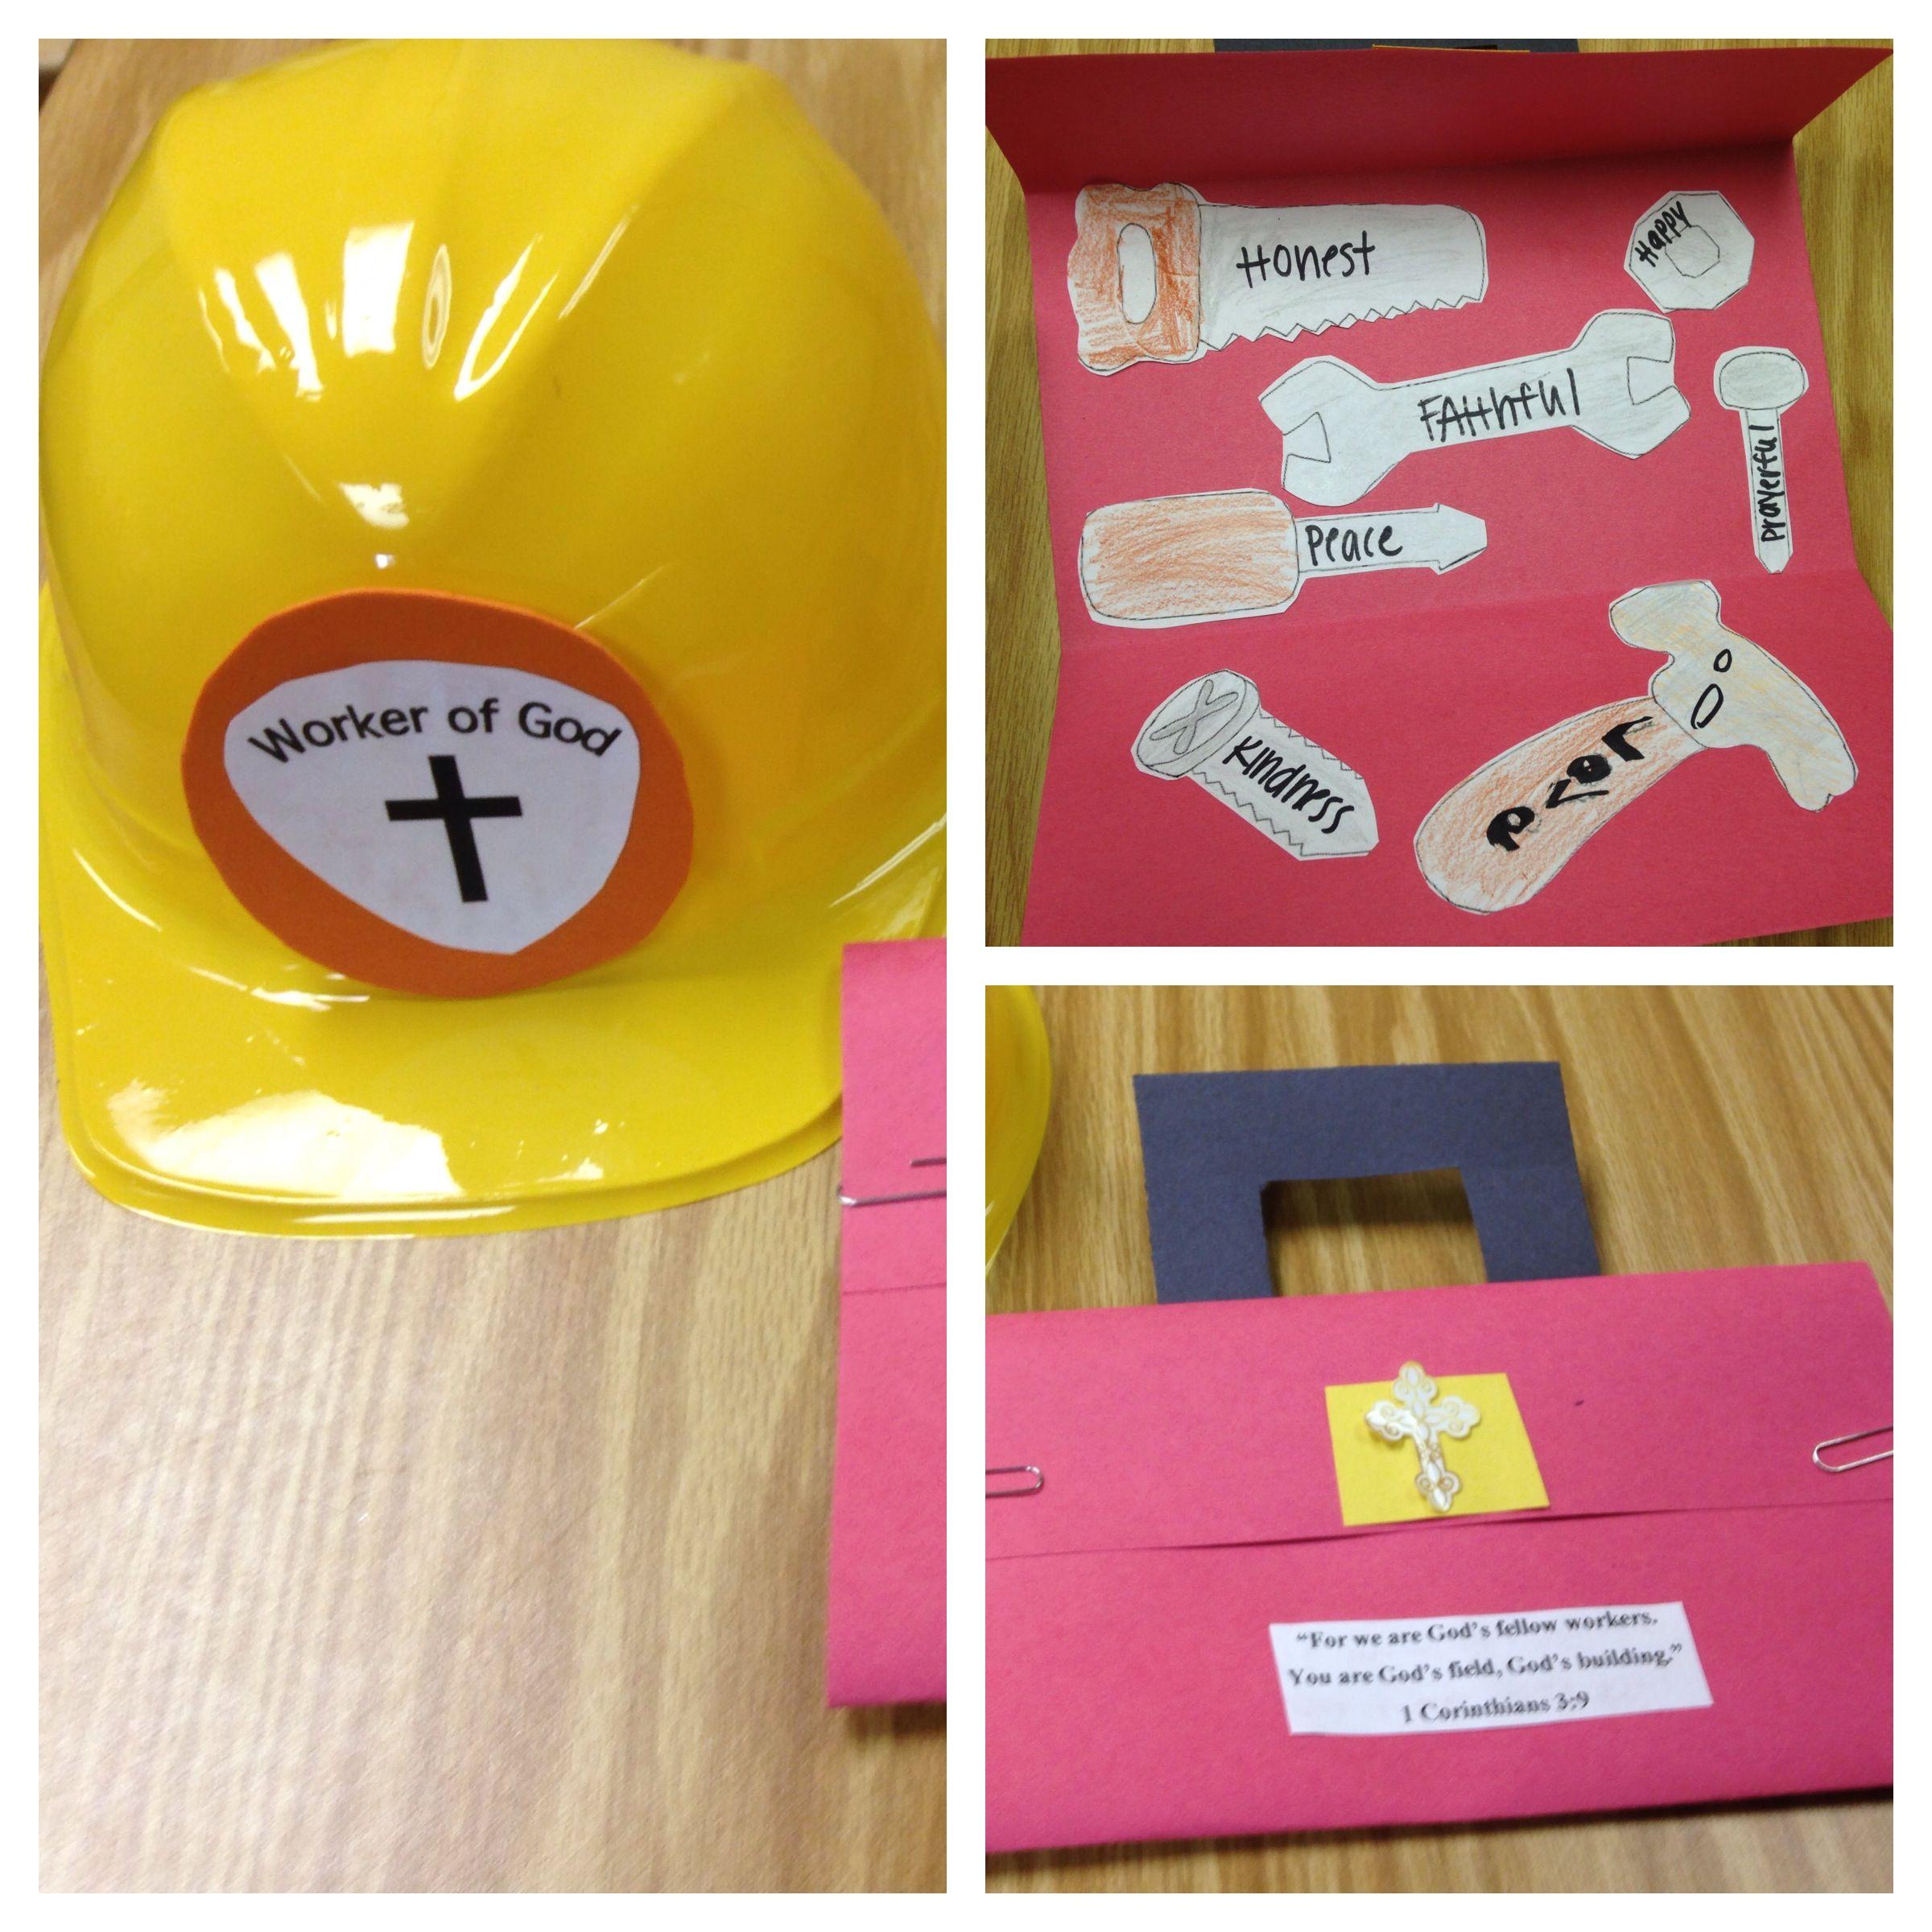 Vacation Bible School Craft Ideas Kids Part - 43: Workers Of God Craft! 1 Corinthians 3:9 Construction Hat And A Christian  Toolbox · Sunday School ActivitiesPreschool ...